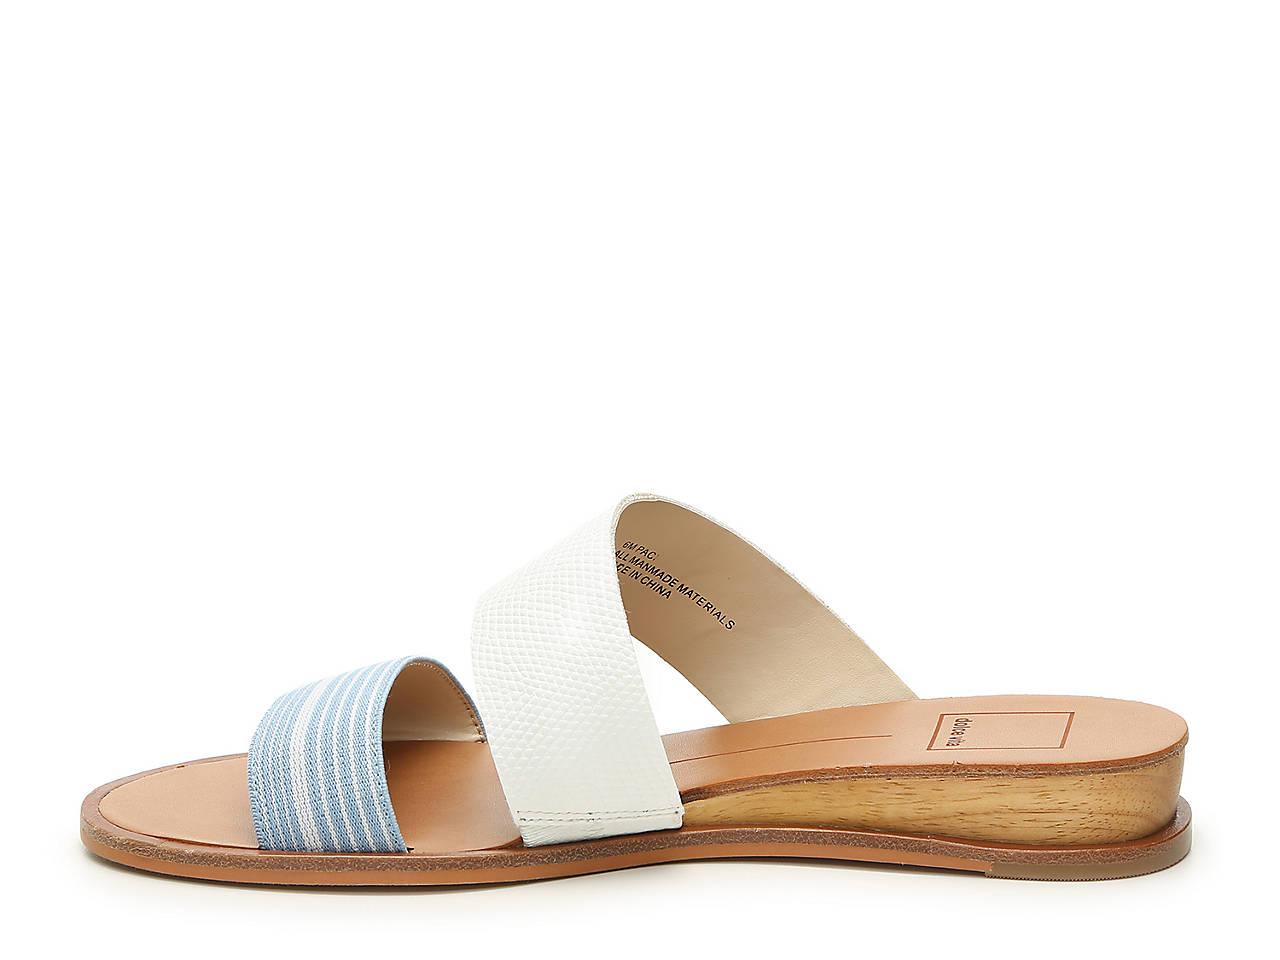 7a11b9738e3e Dolce Vita Paci Wedge Sandal Women s Shoes